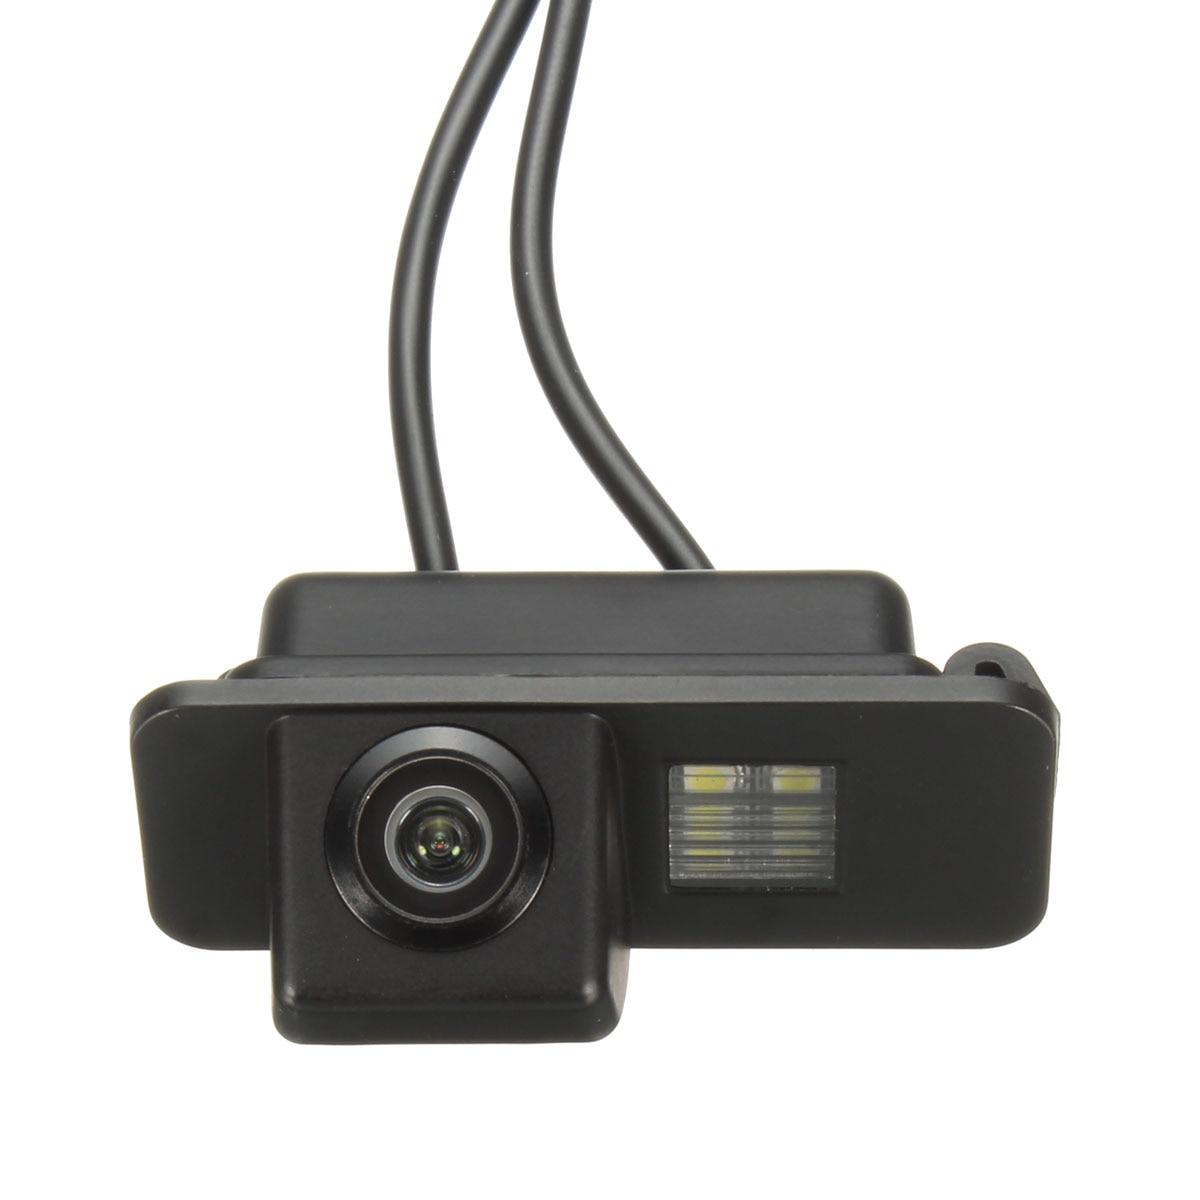 2016 Nueva visión trasera inversa cámara cámaras para Ford/Mondeo/focus/fiesta/Kuga